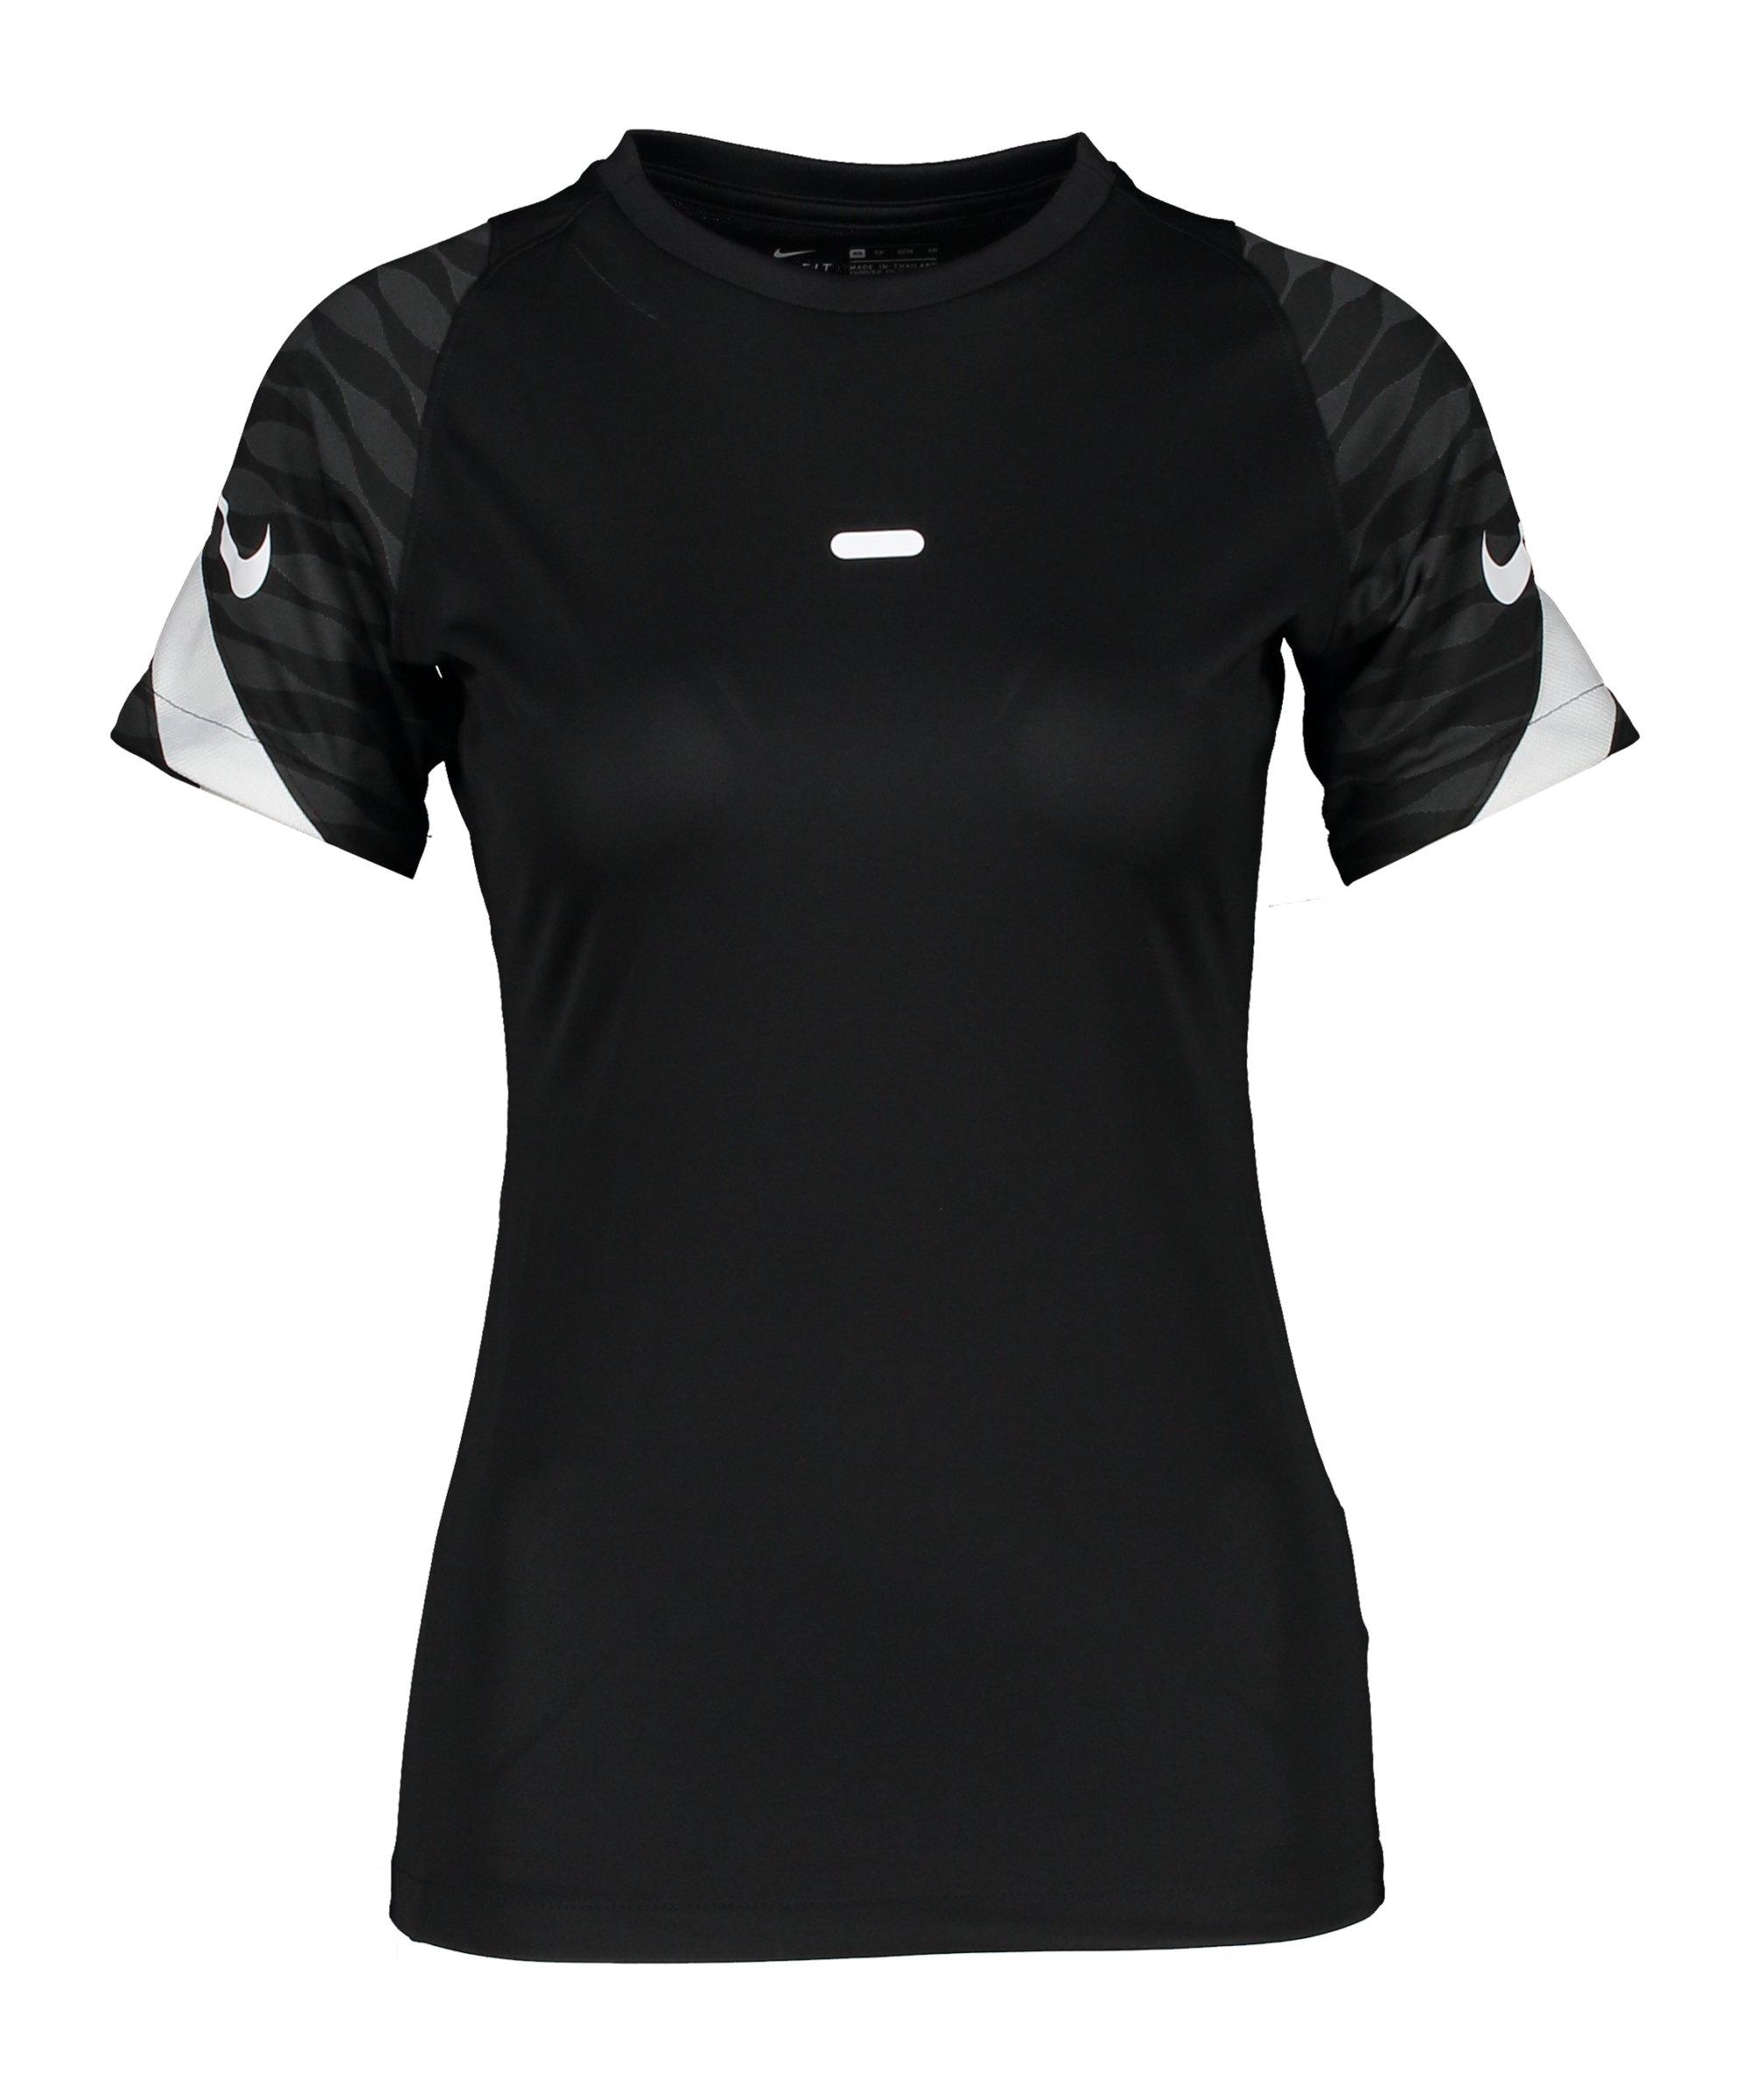 Nike Strike 21 T-Shirt Damen Schwarz Weiss F010 - schwarz